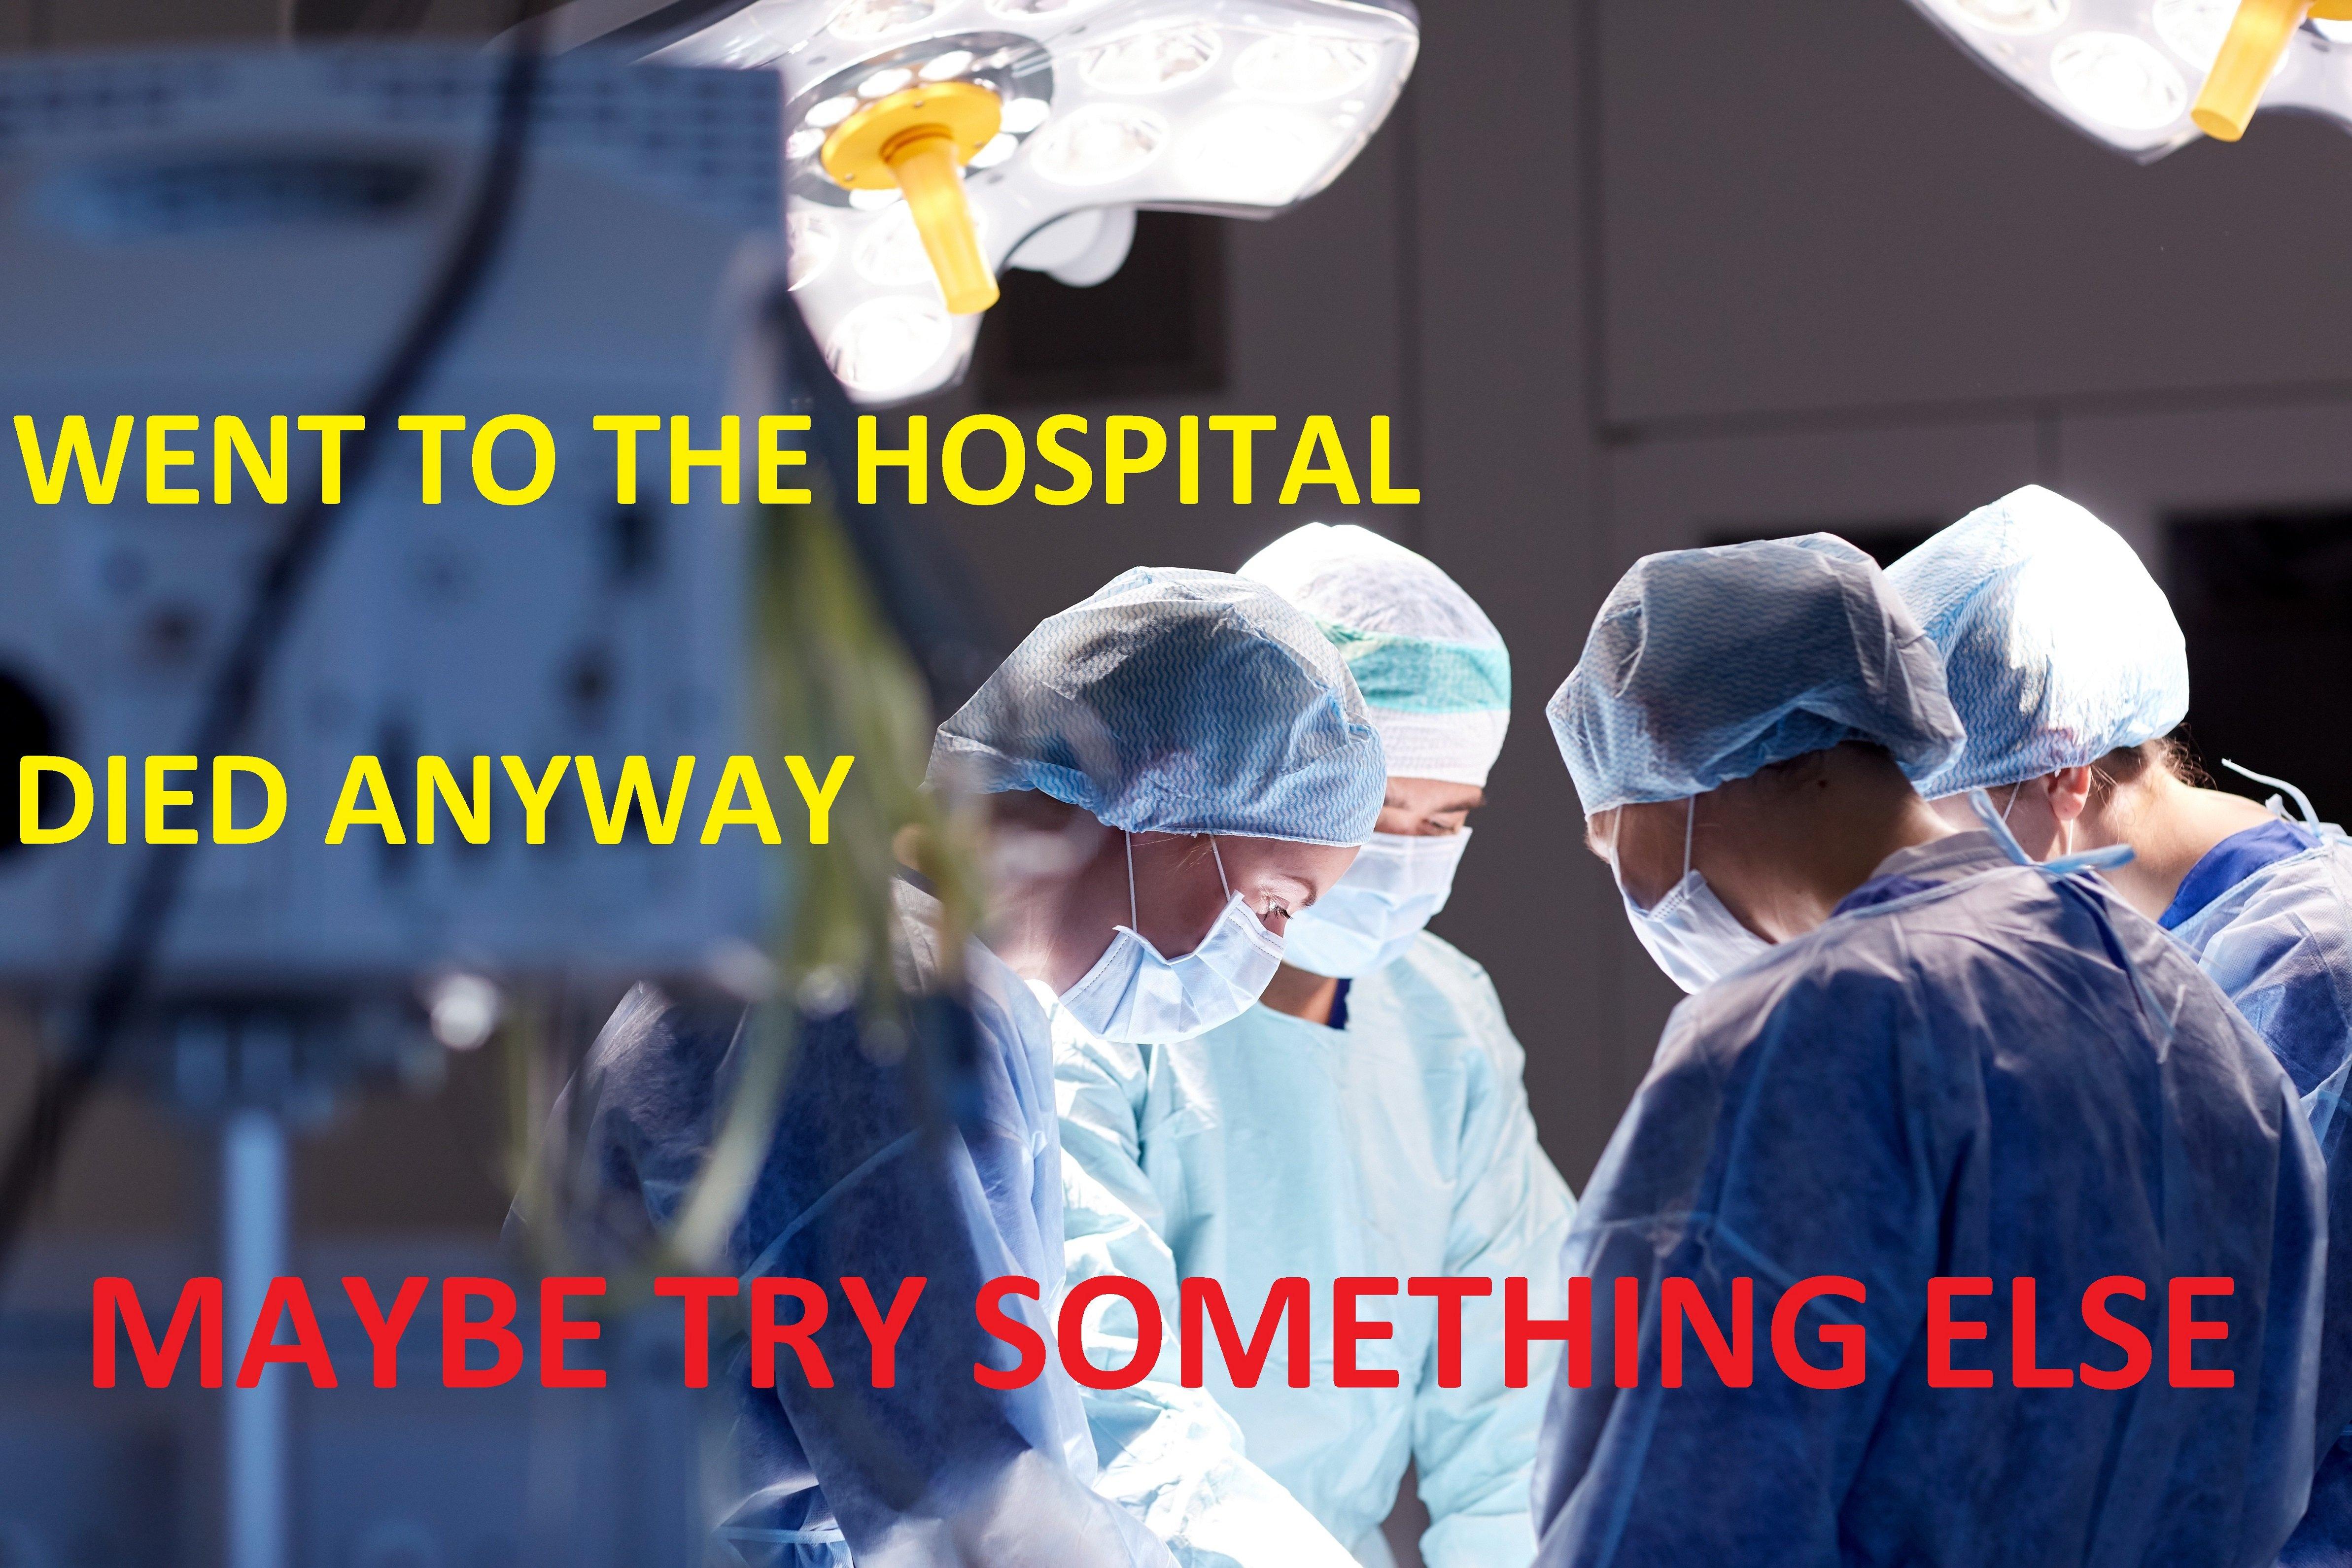 Hospital meme